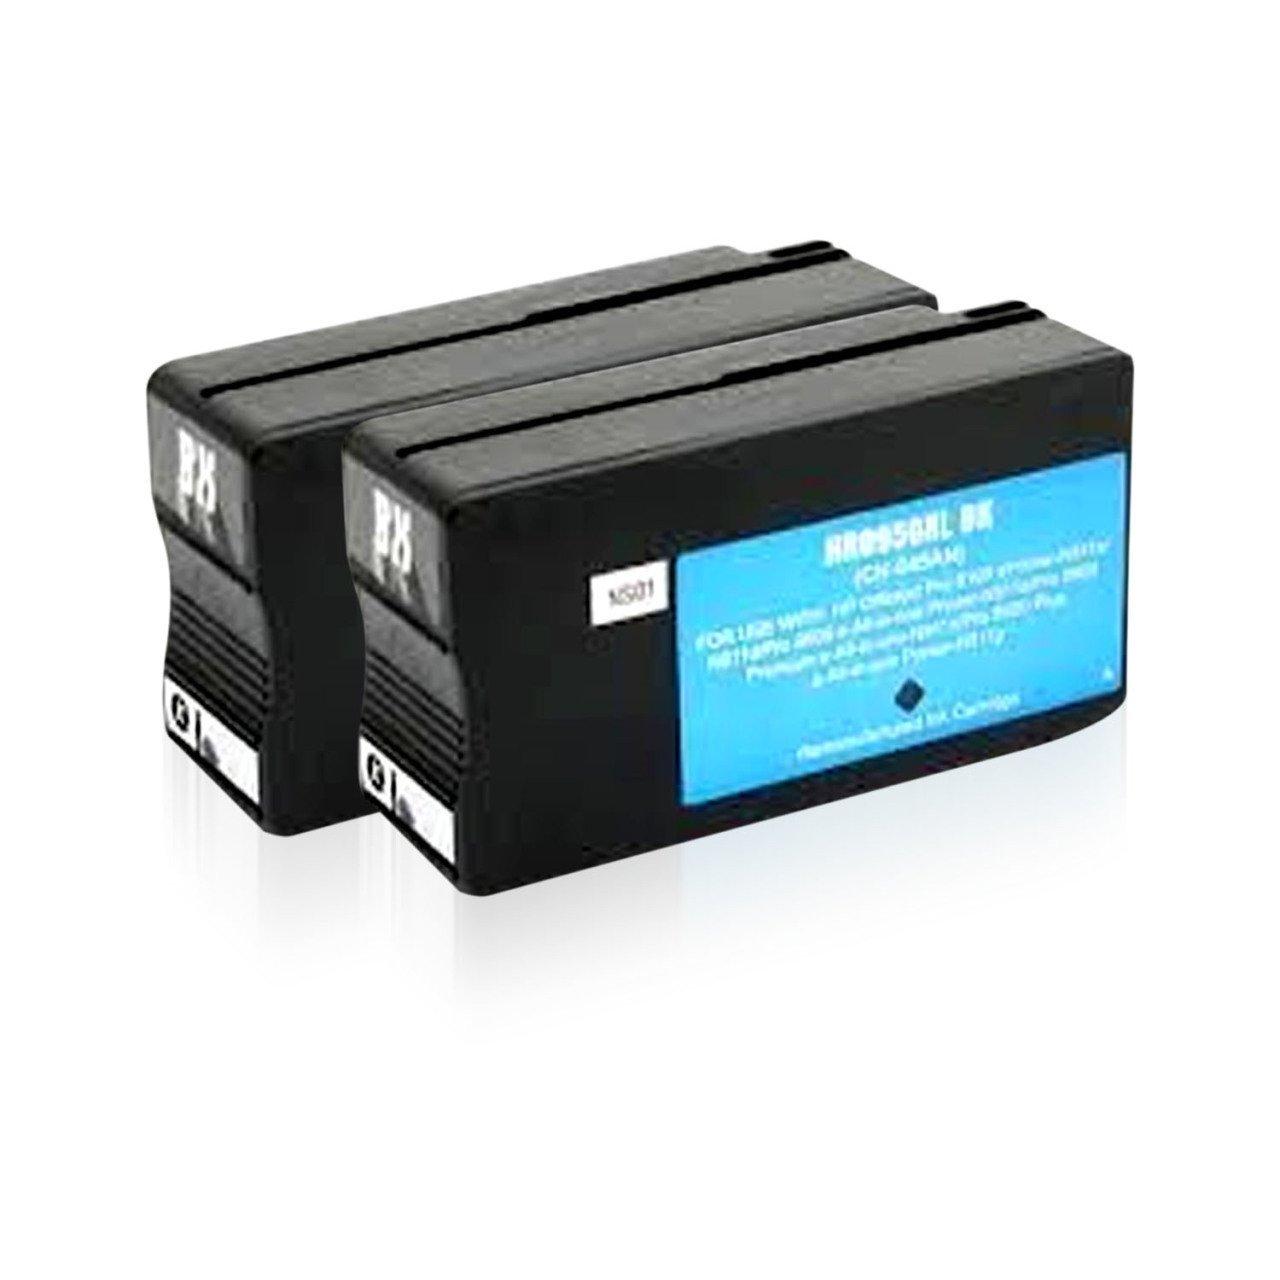 2 ADET HP 950XL UYUMLU SİYAH KARTUŞ - Pro 8600 Plus/ Pro 251/ Pro 276/ Pro 8100/ 8610/ 8620